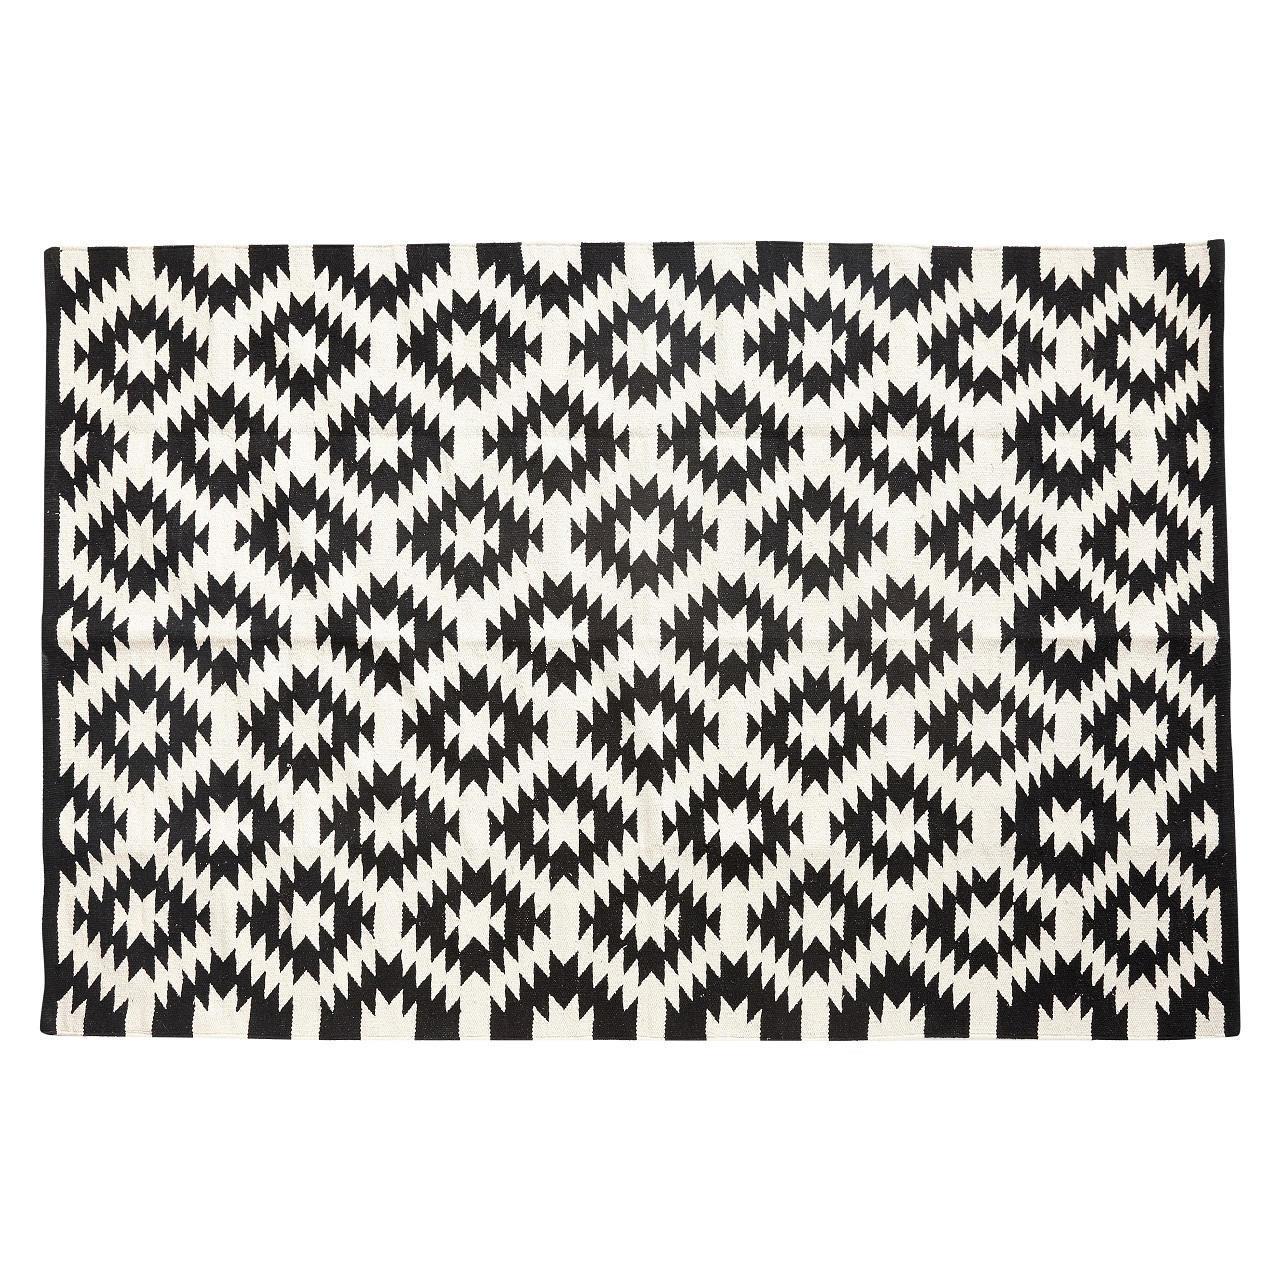 Hübsch Tkaný koberec Nature/black 120x180 Černá